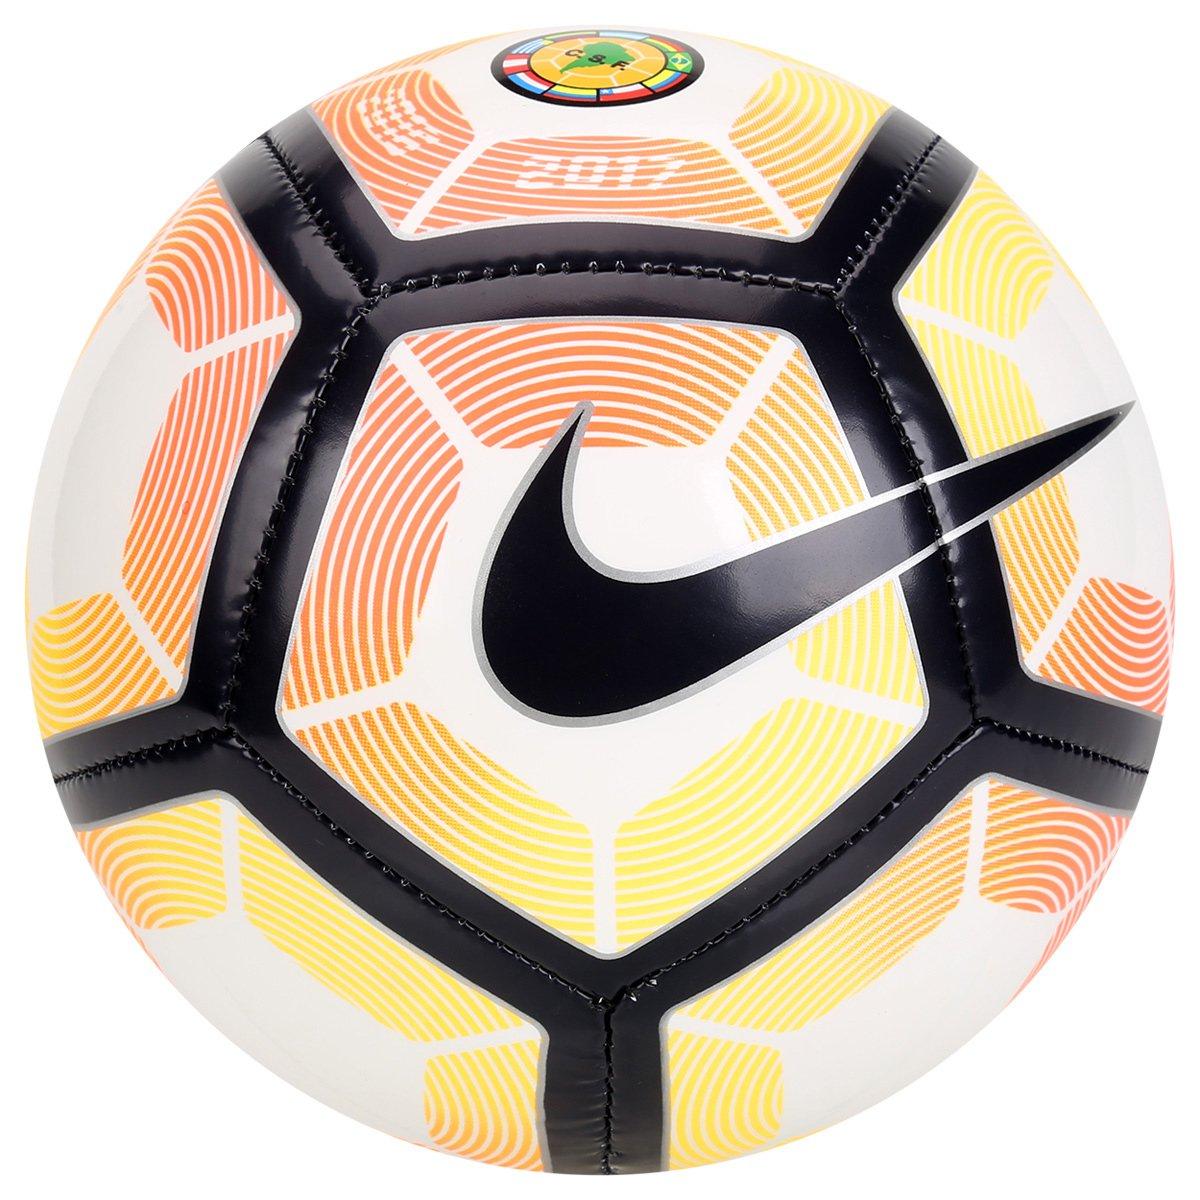 Minibola Nike CSF Skill - Compre Agora  18fc2a973f0ed